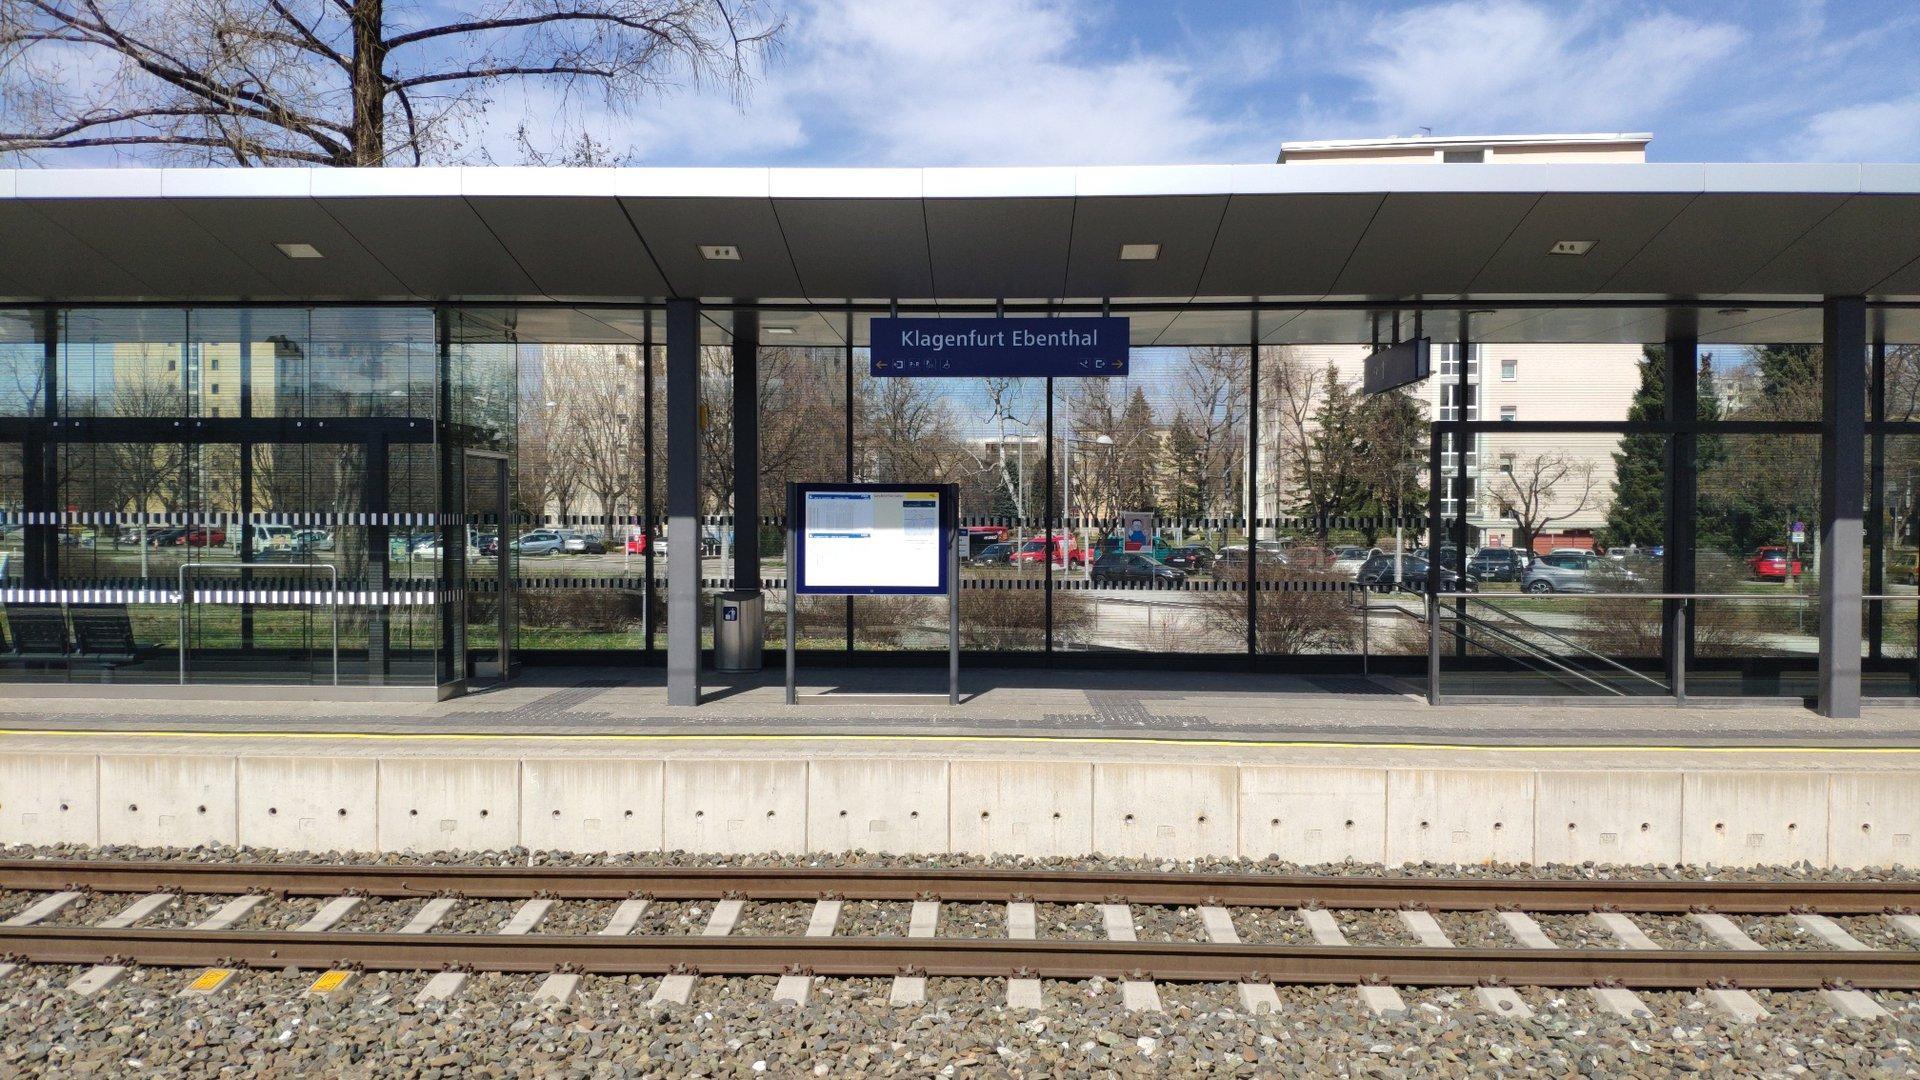 Klagenfurt Ebenthal Bahnhof